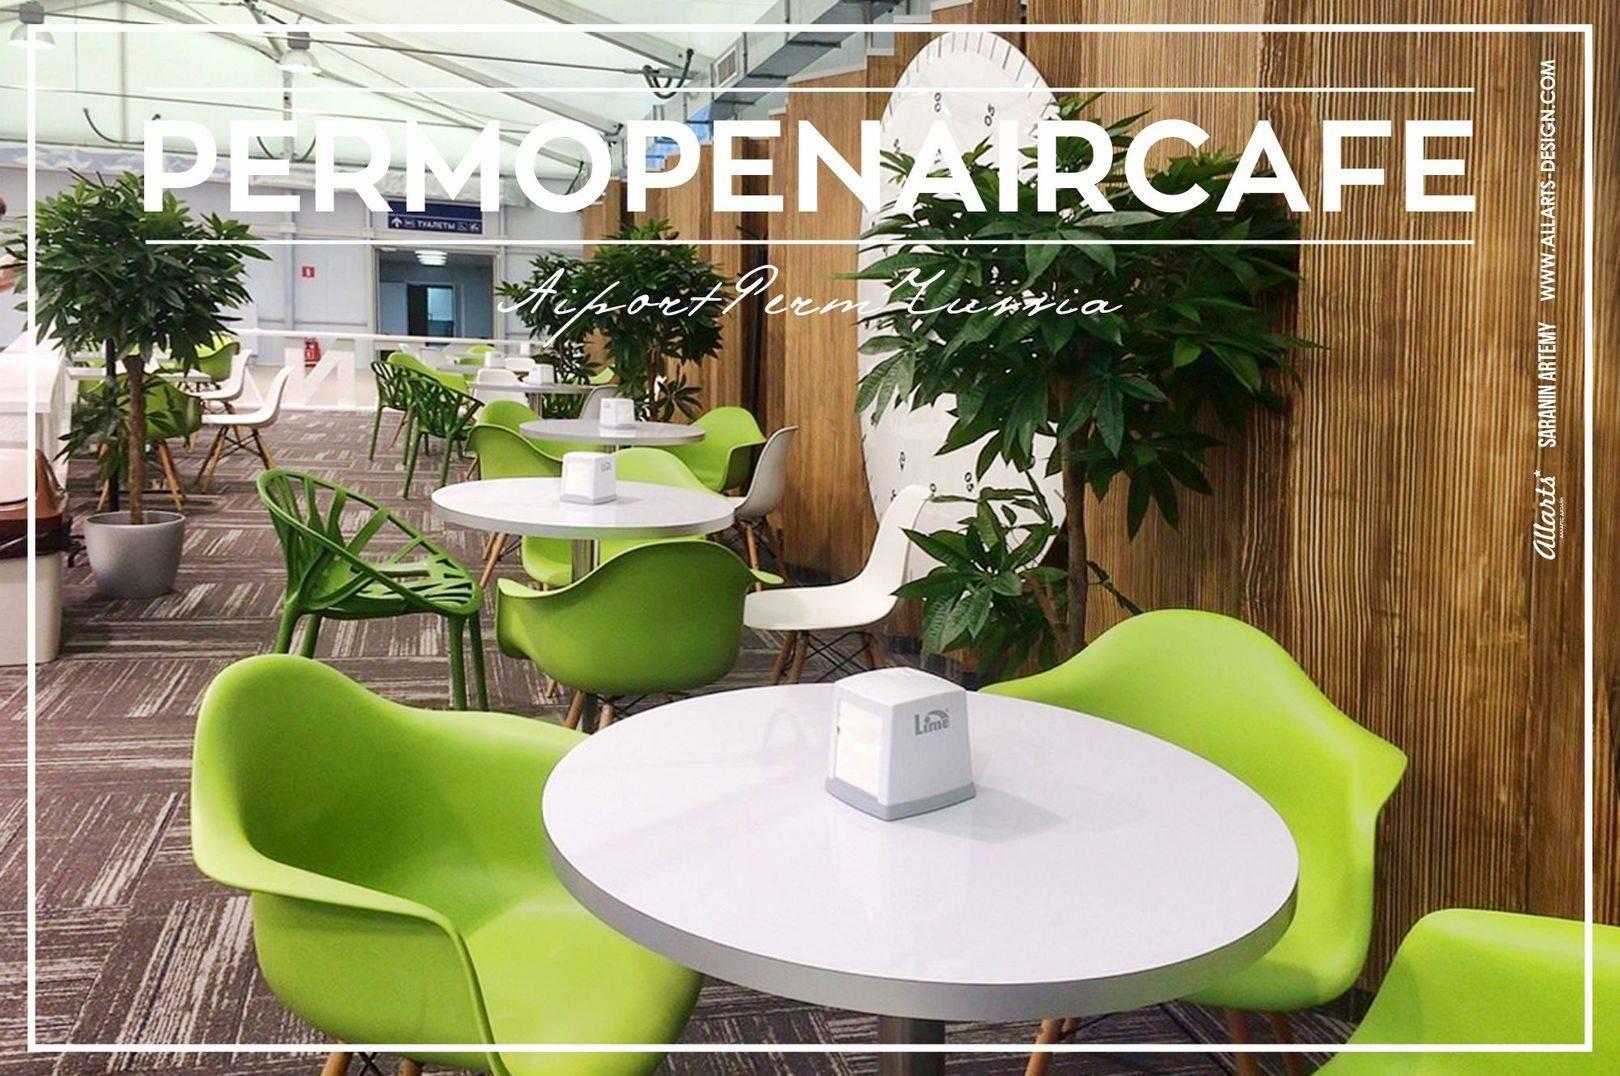 Дизайн интерьера кафе в Аэропорту Permopencafe